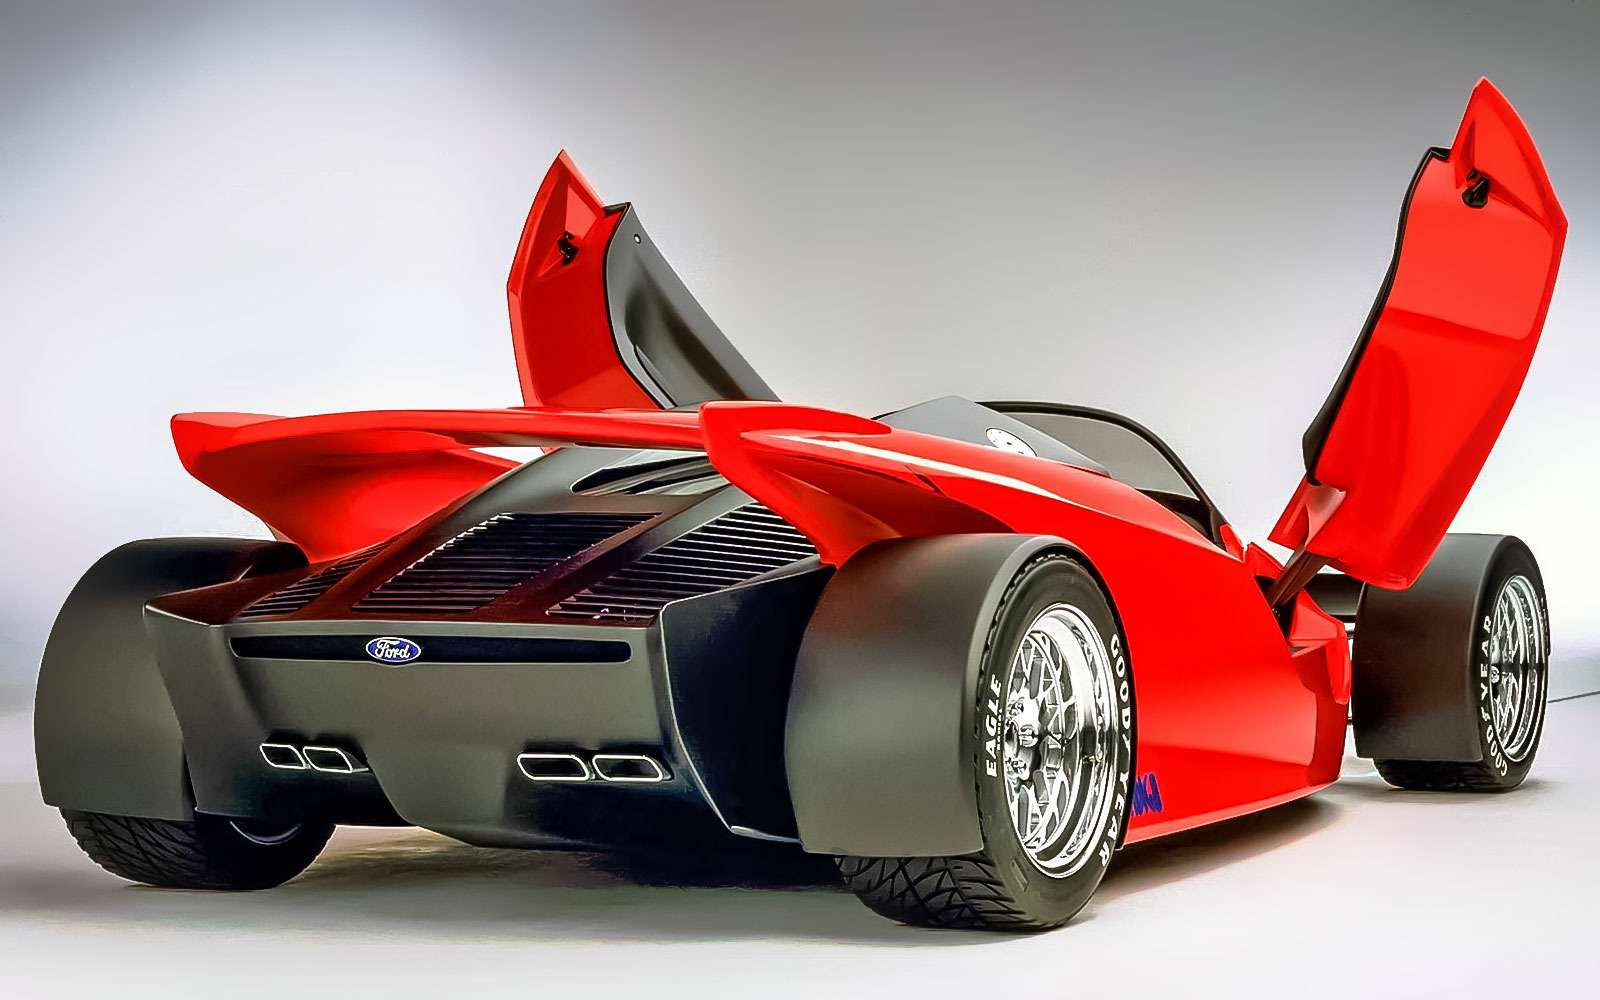 1996 Ford Indigo